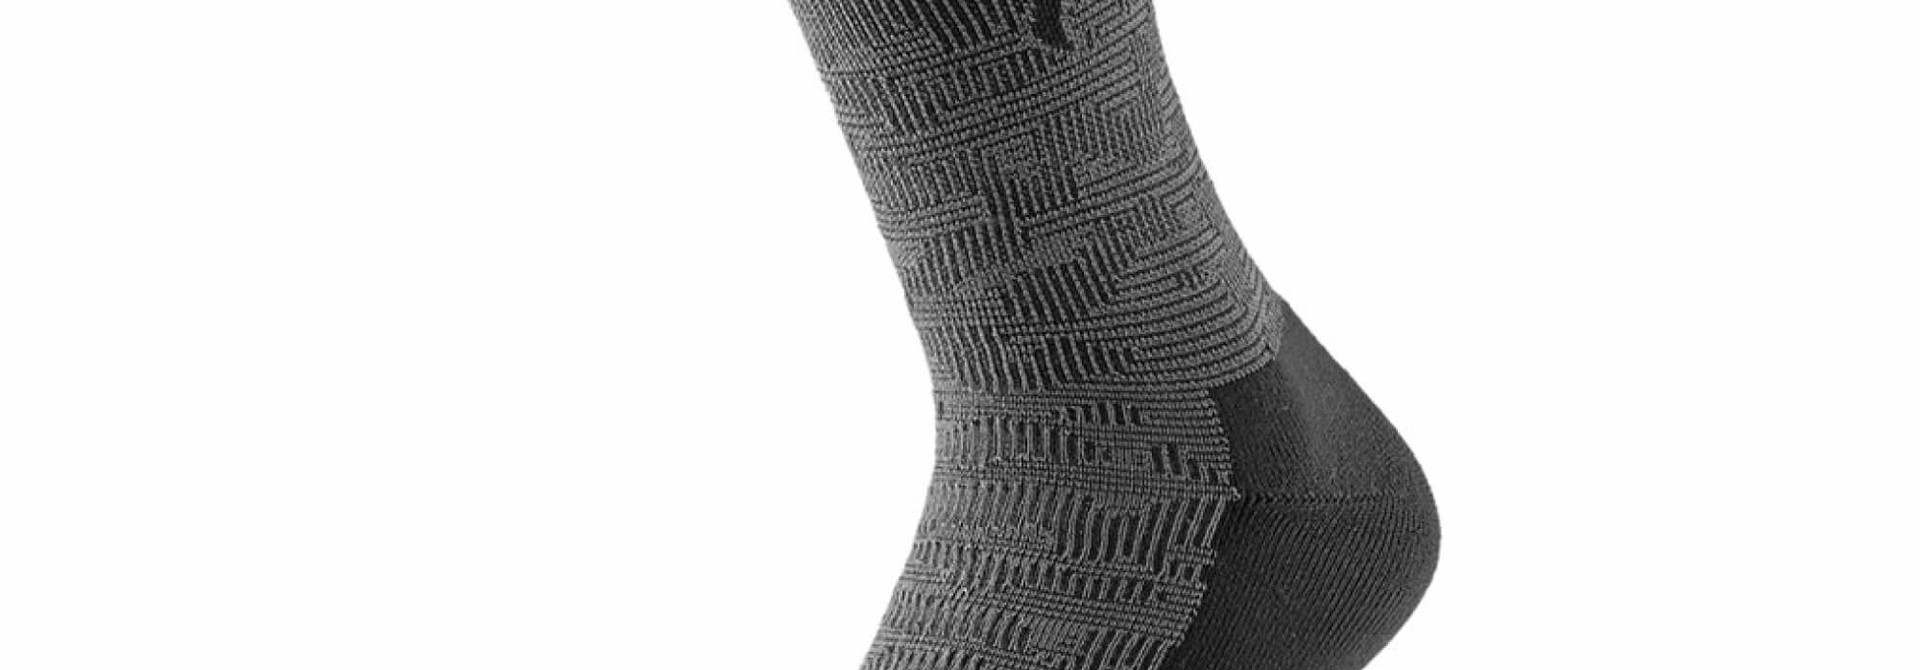 Primaloft Lightweight Tall Sock